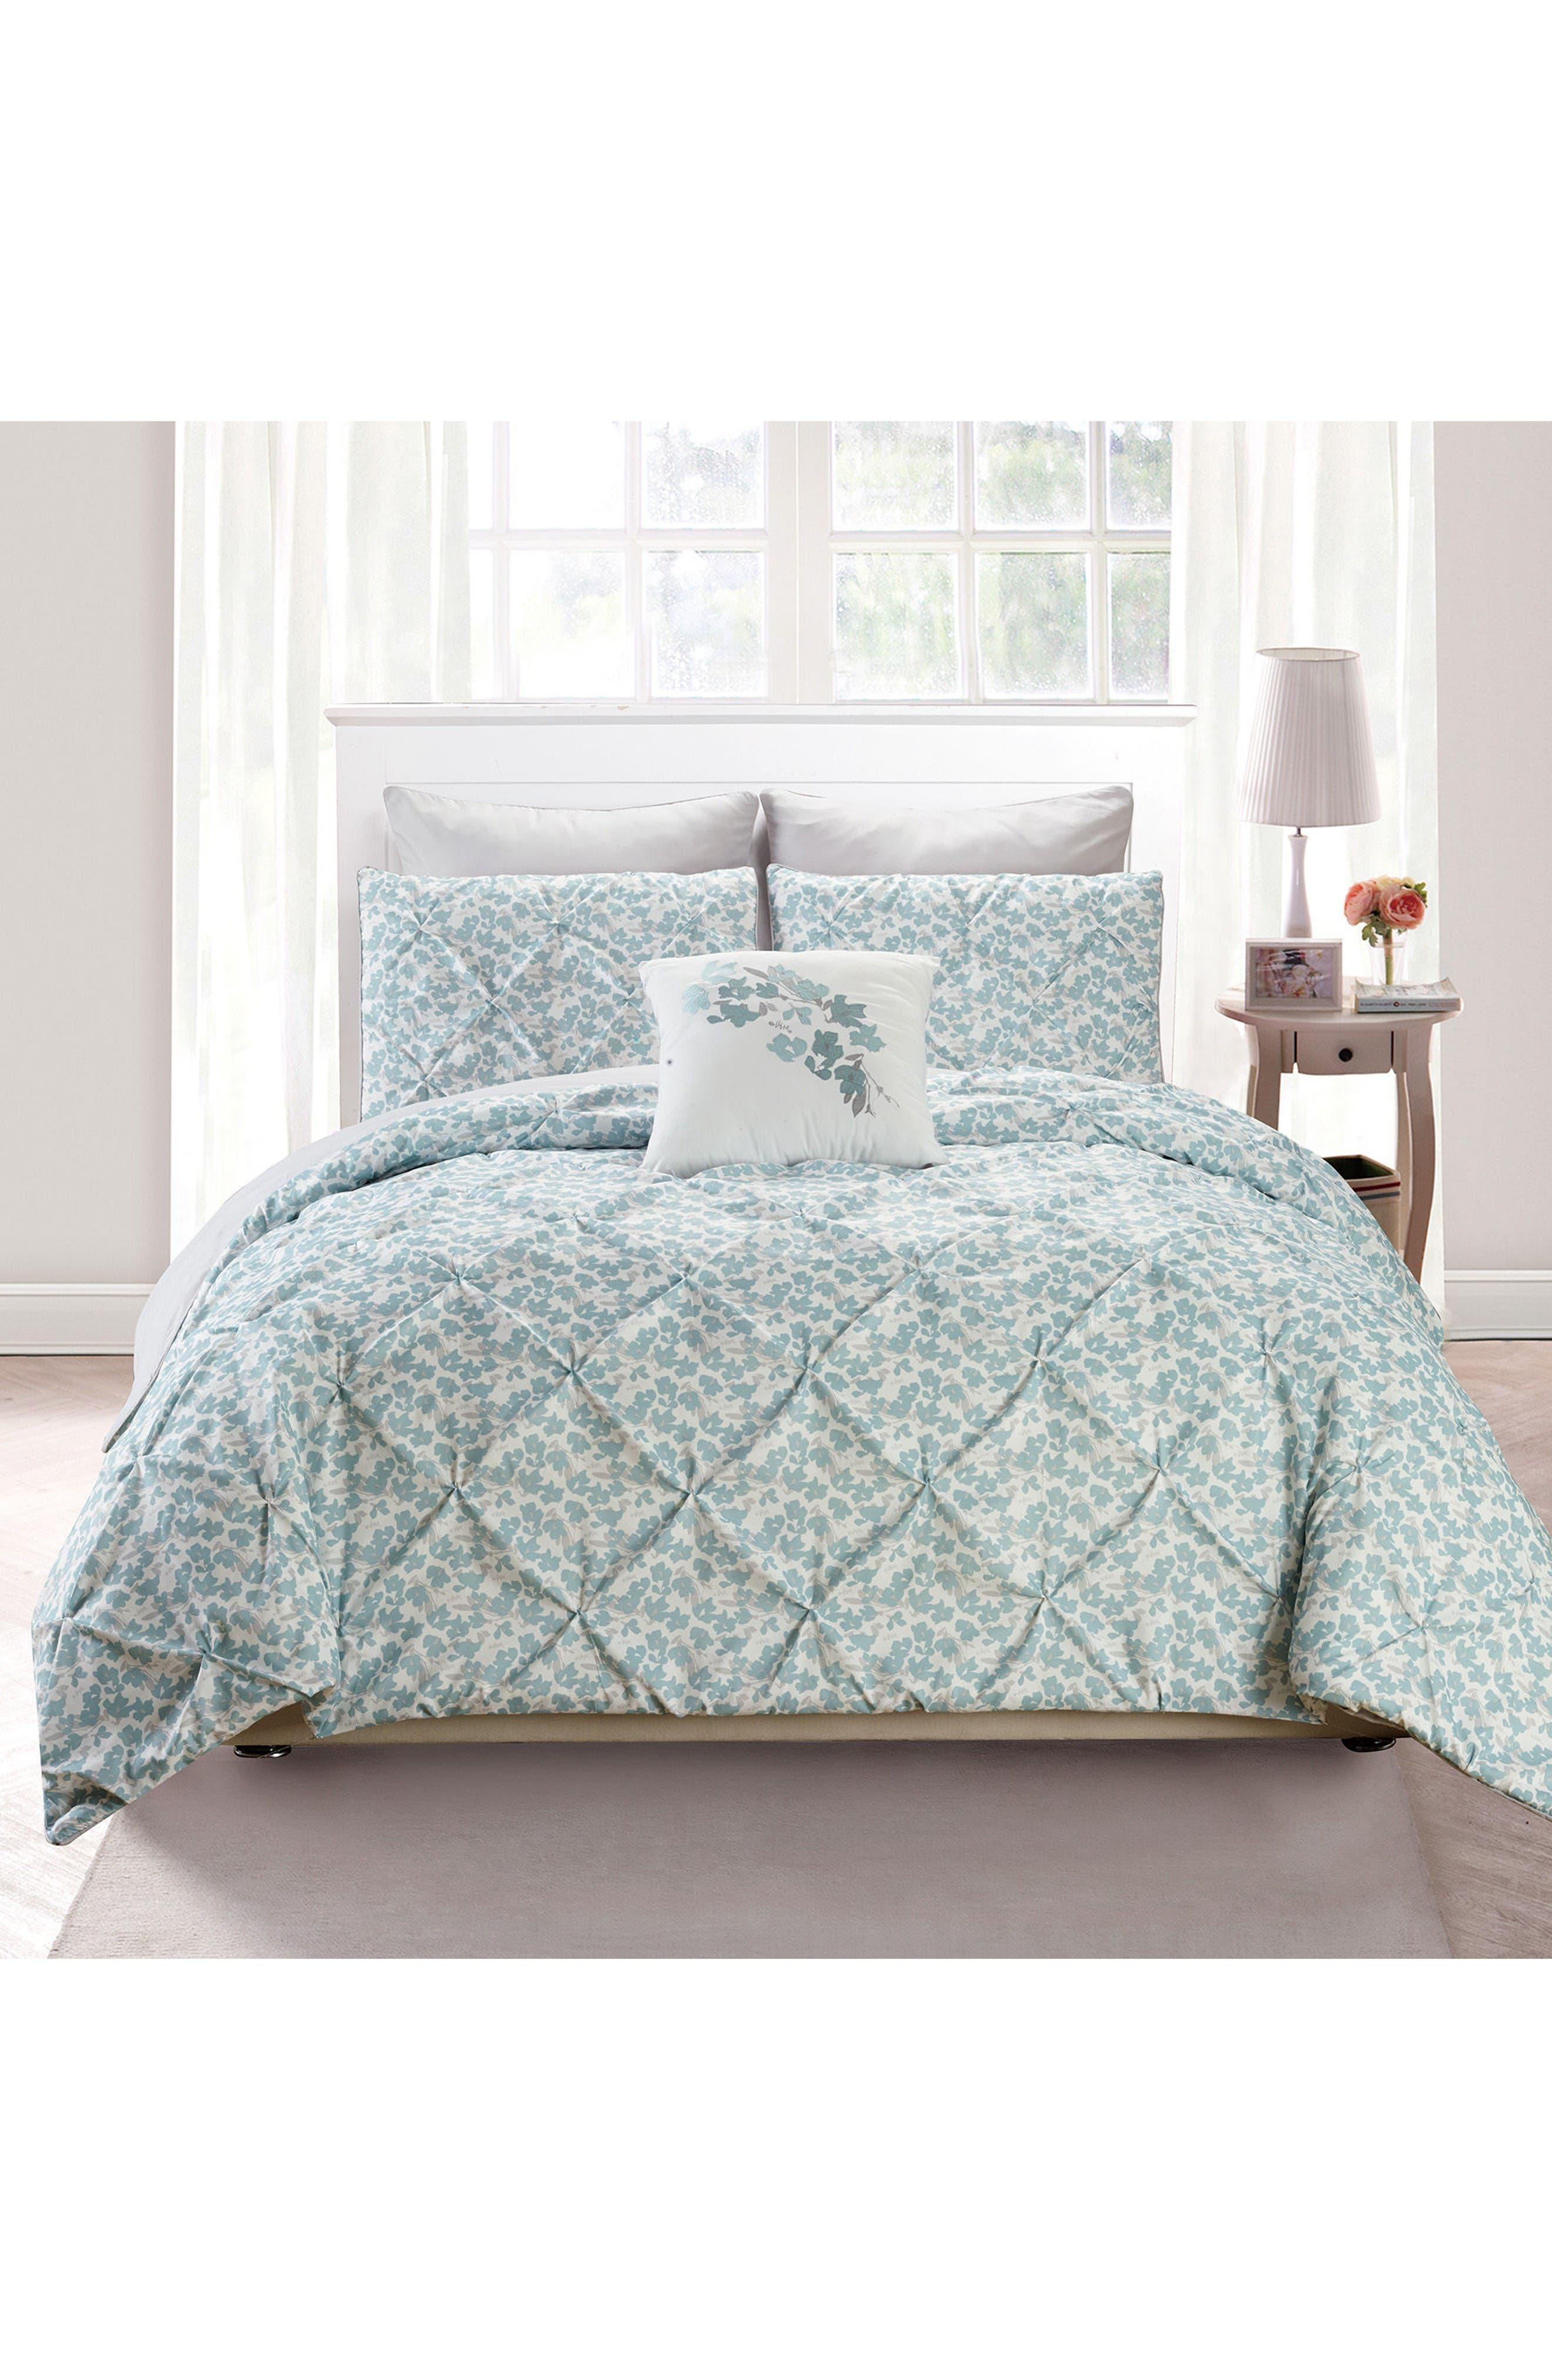 Main Image - Vera Adith 6-Piece King Comforter Set